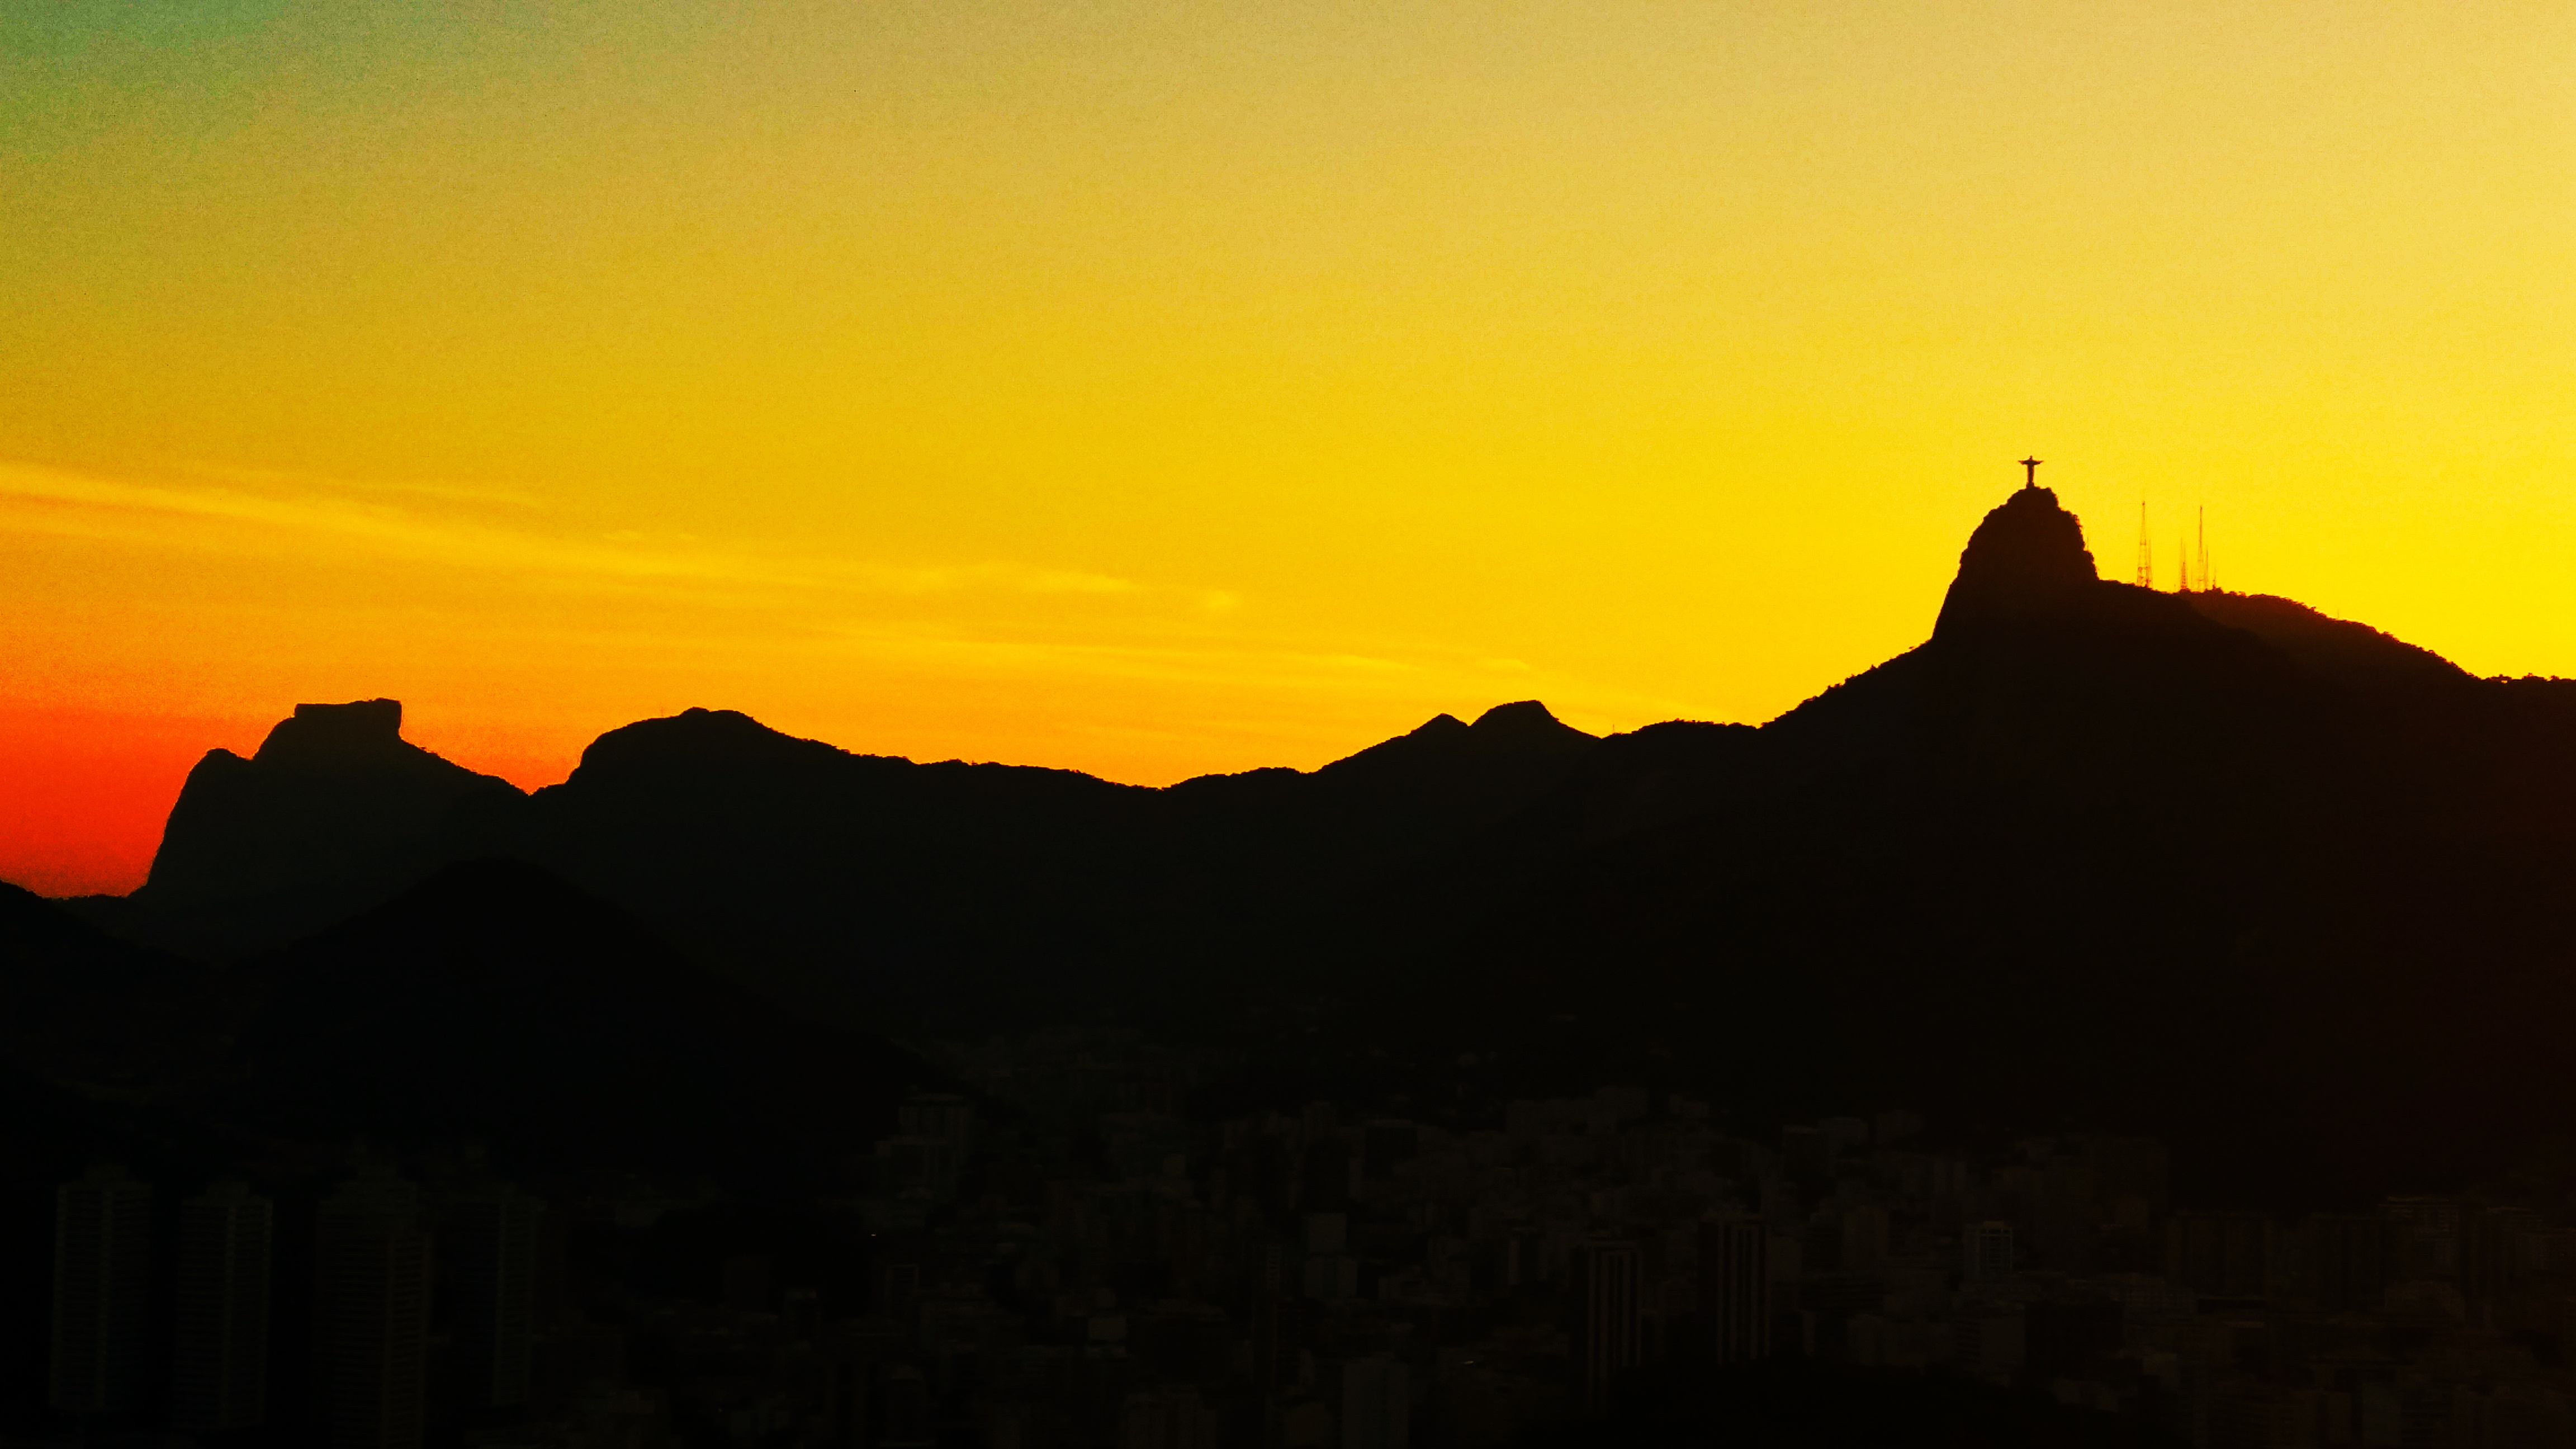 Sunset in Sugar Loaf, Rio de Janeiro